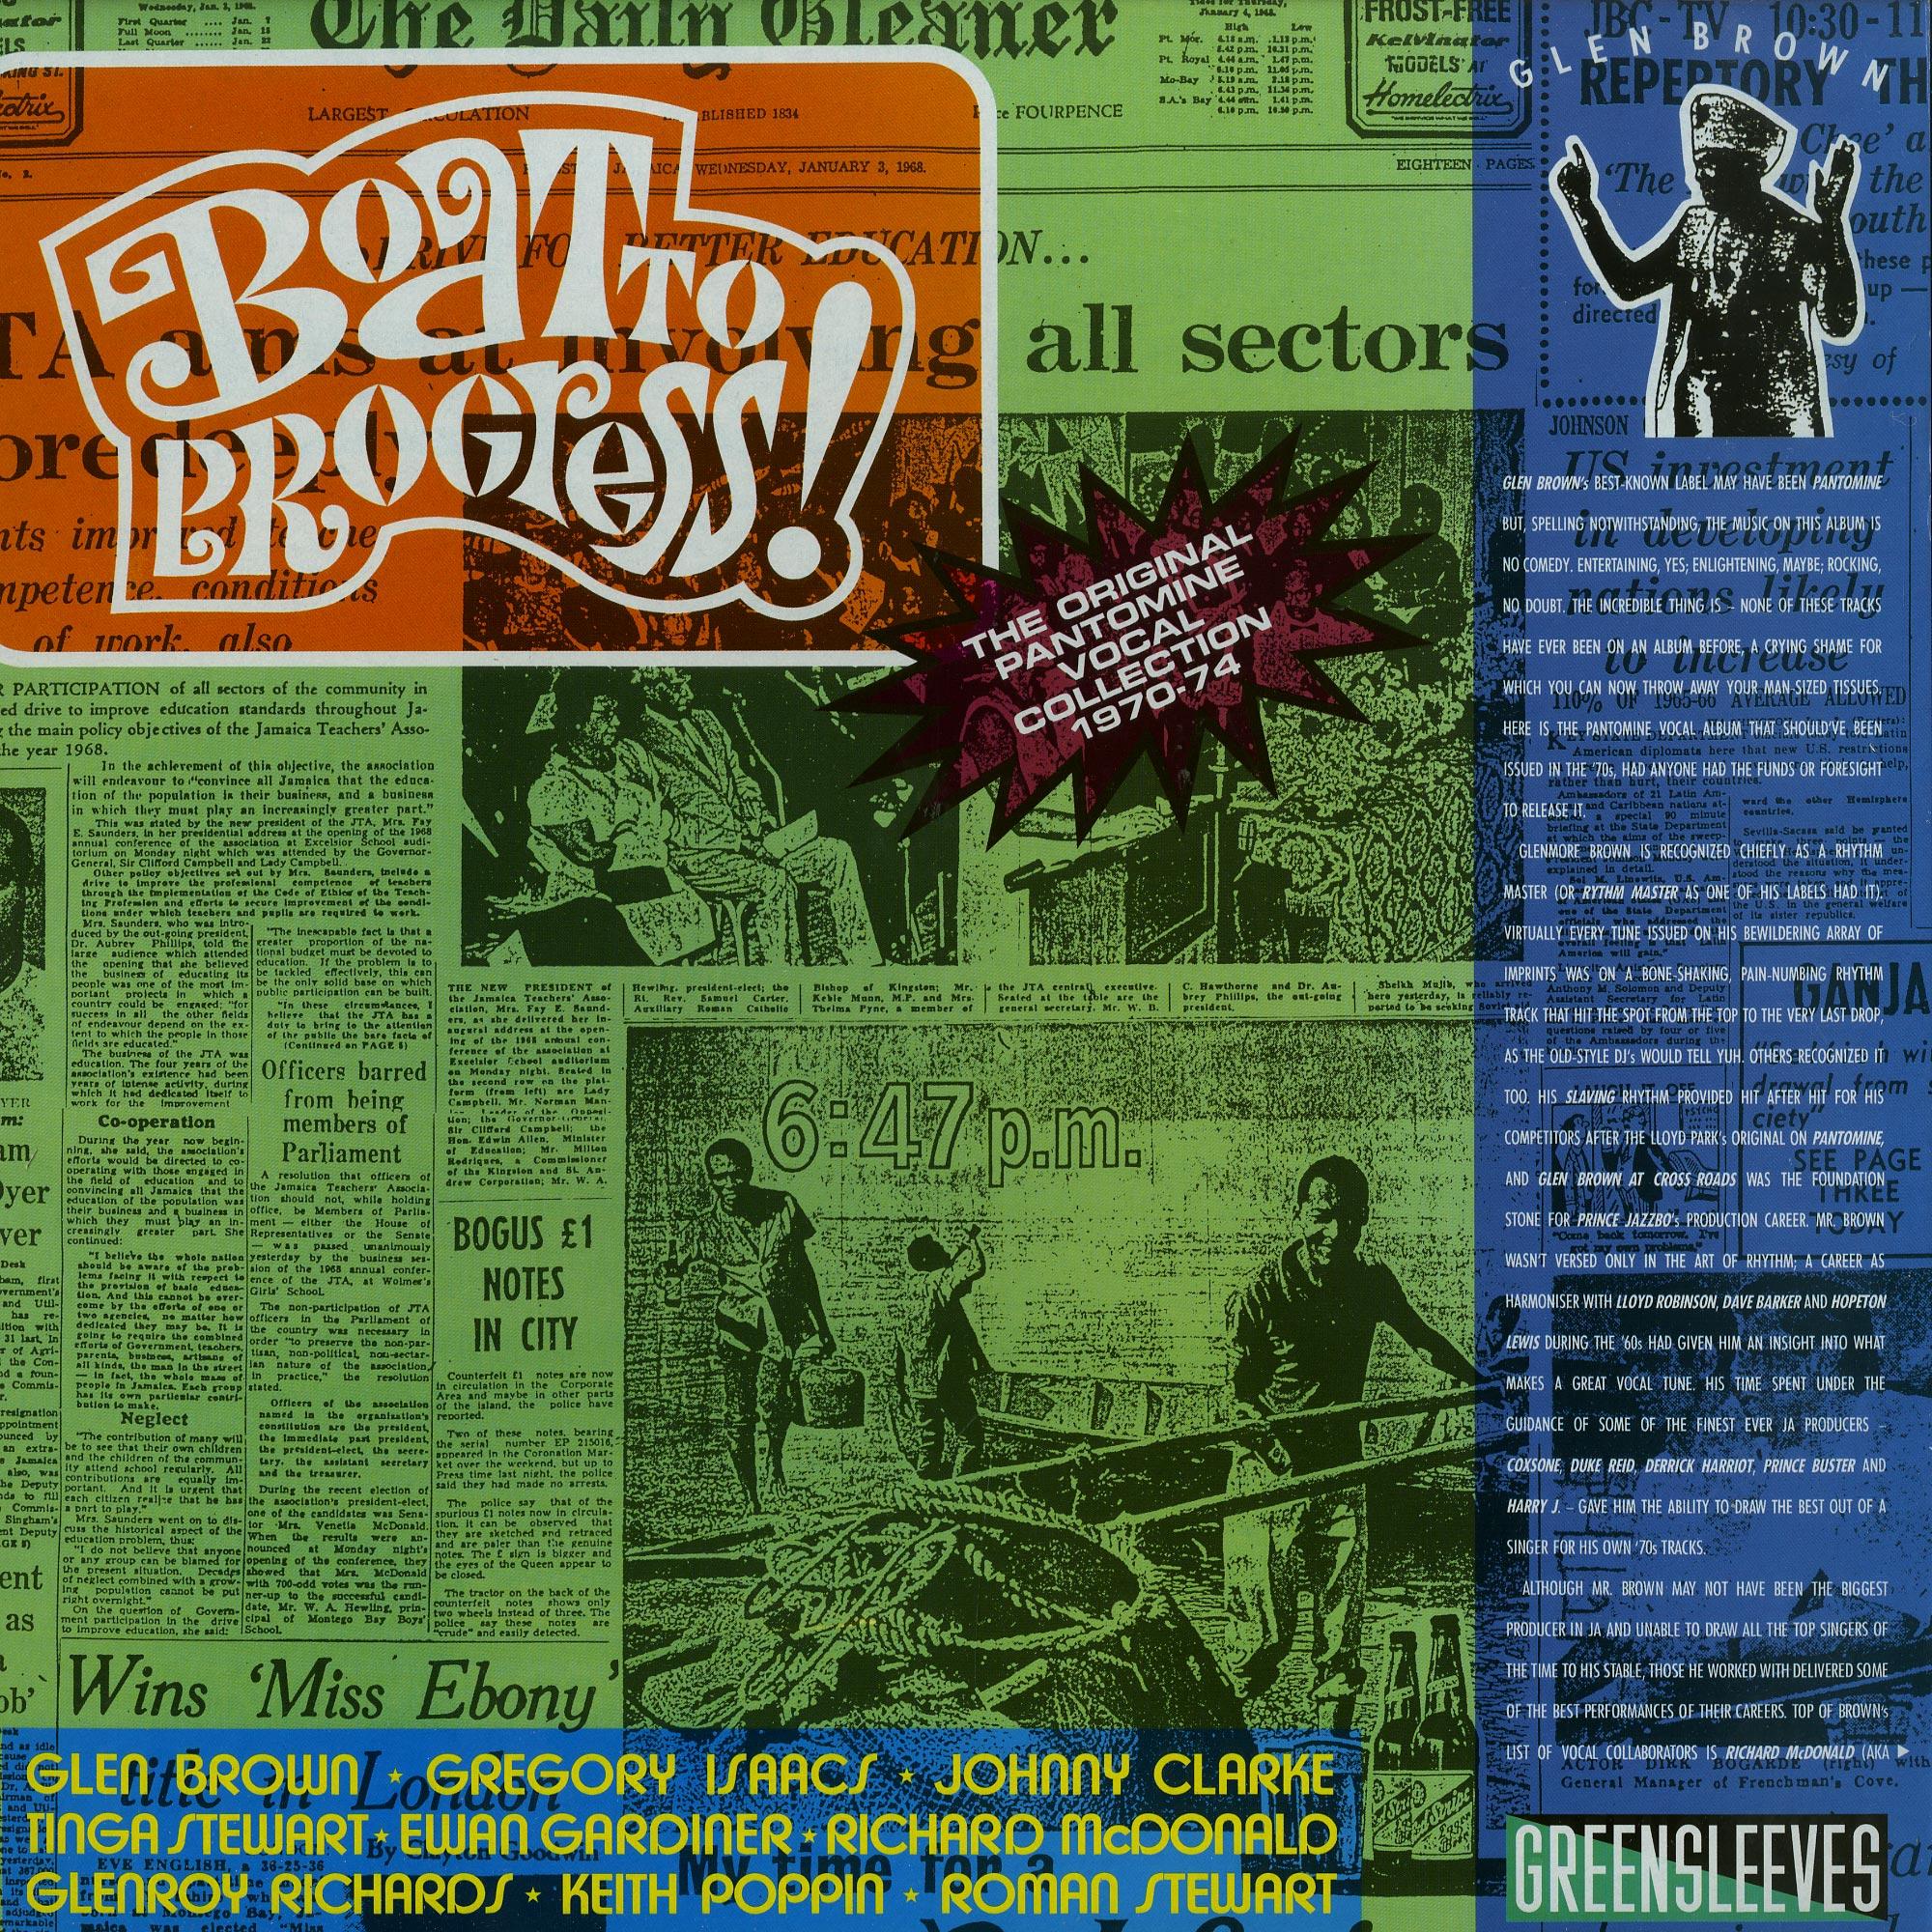 Glen Brown - THE SINGERS 1970-1974 BOAT TO PROGRESS